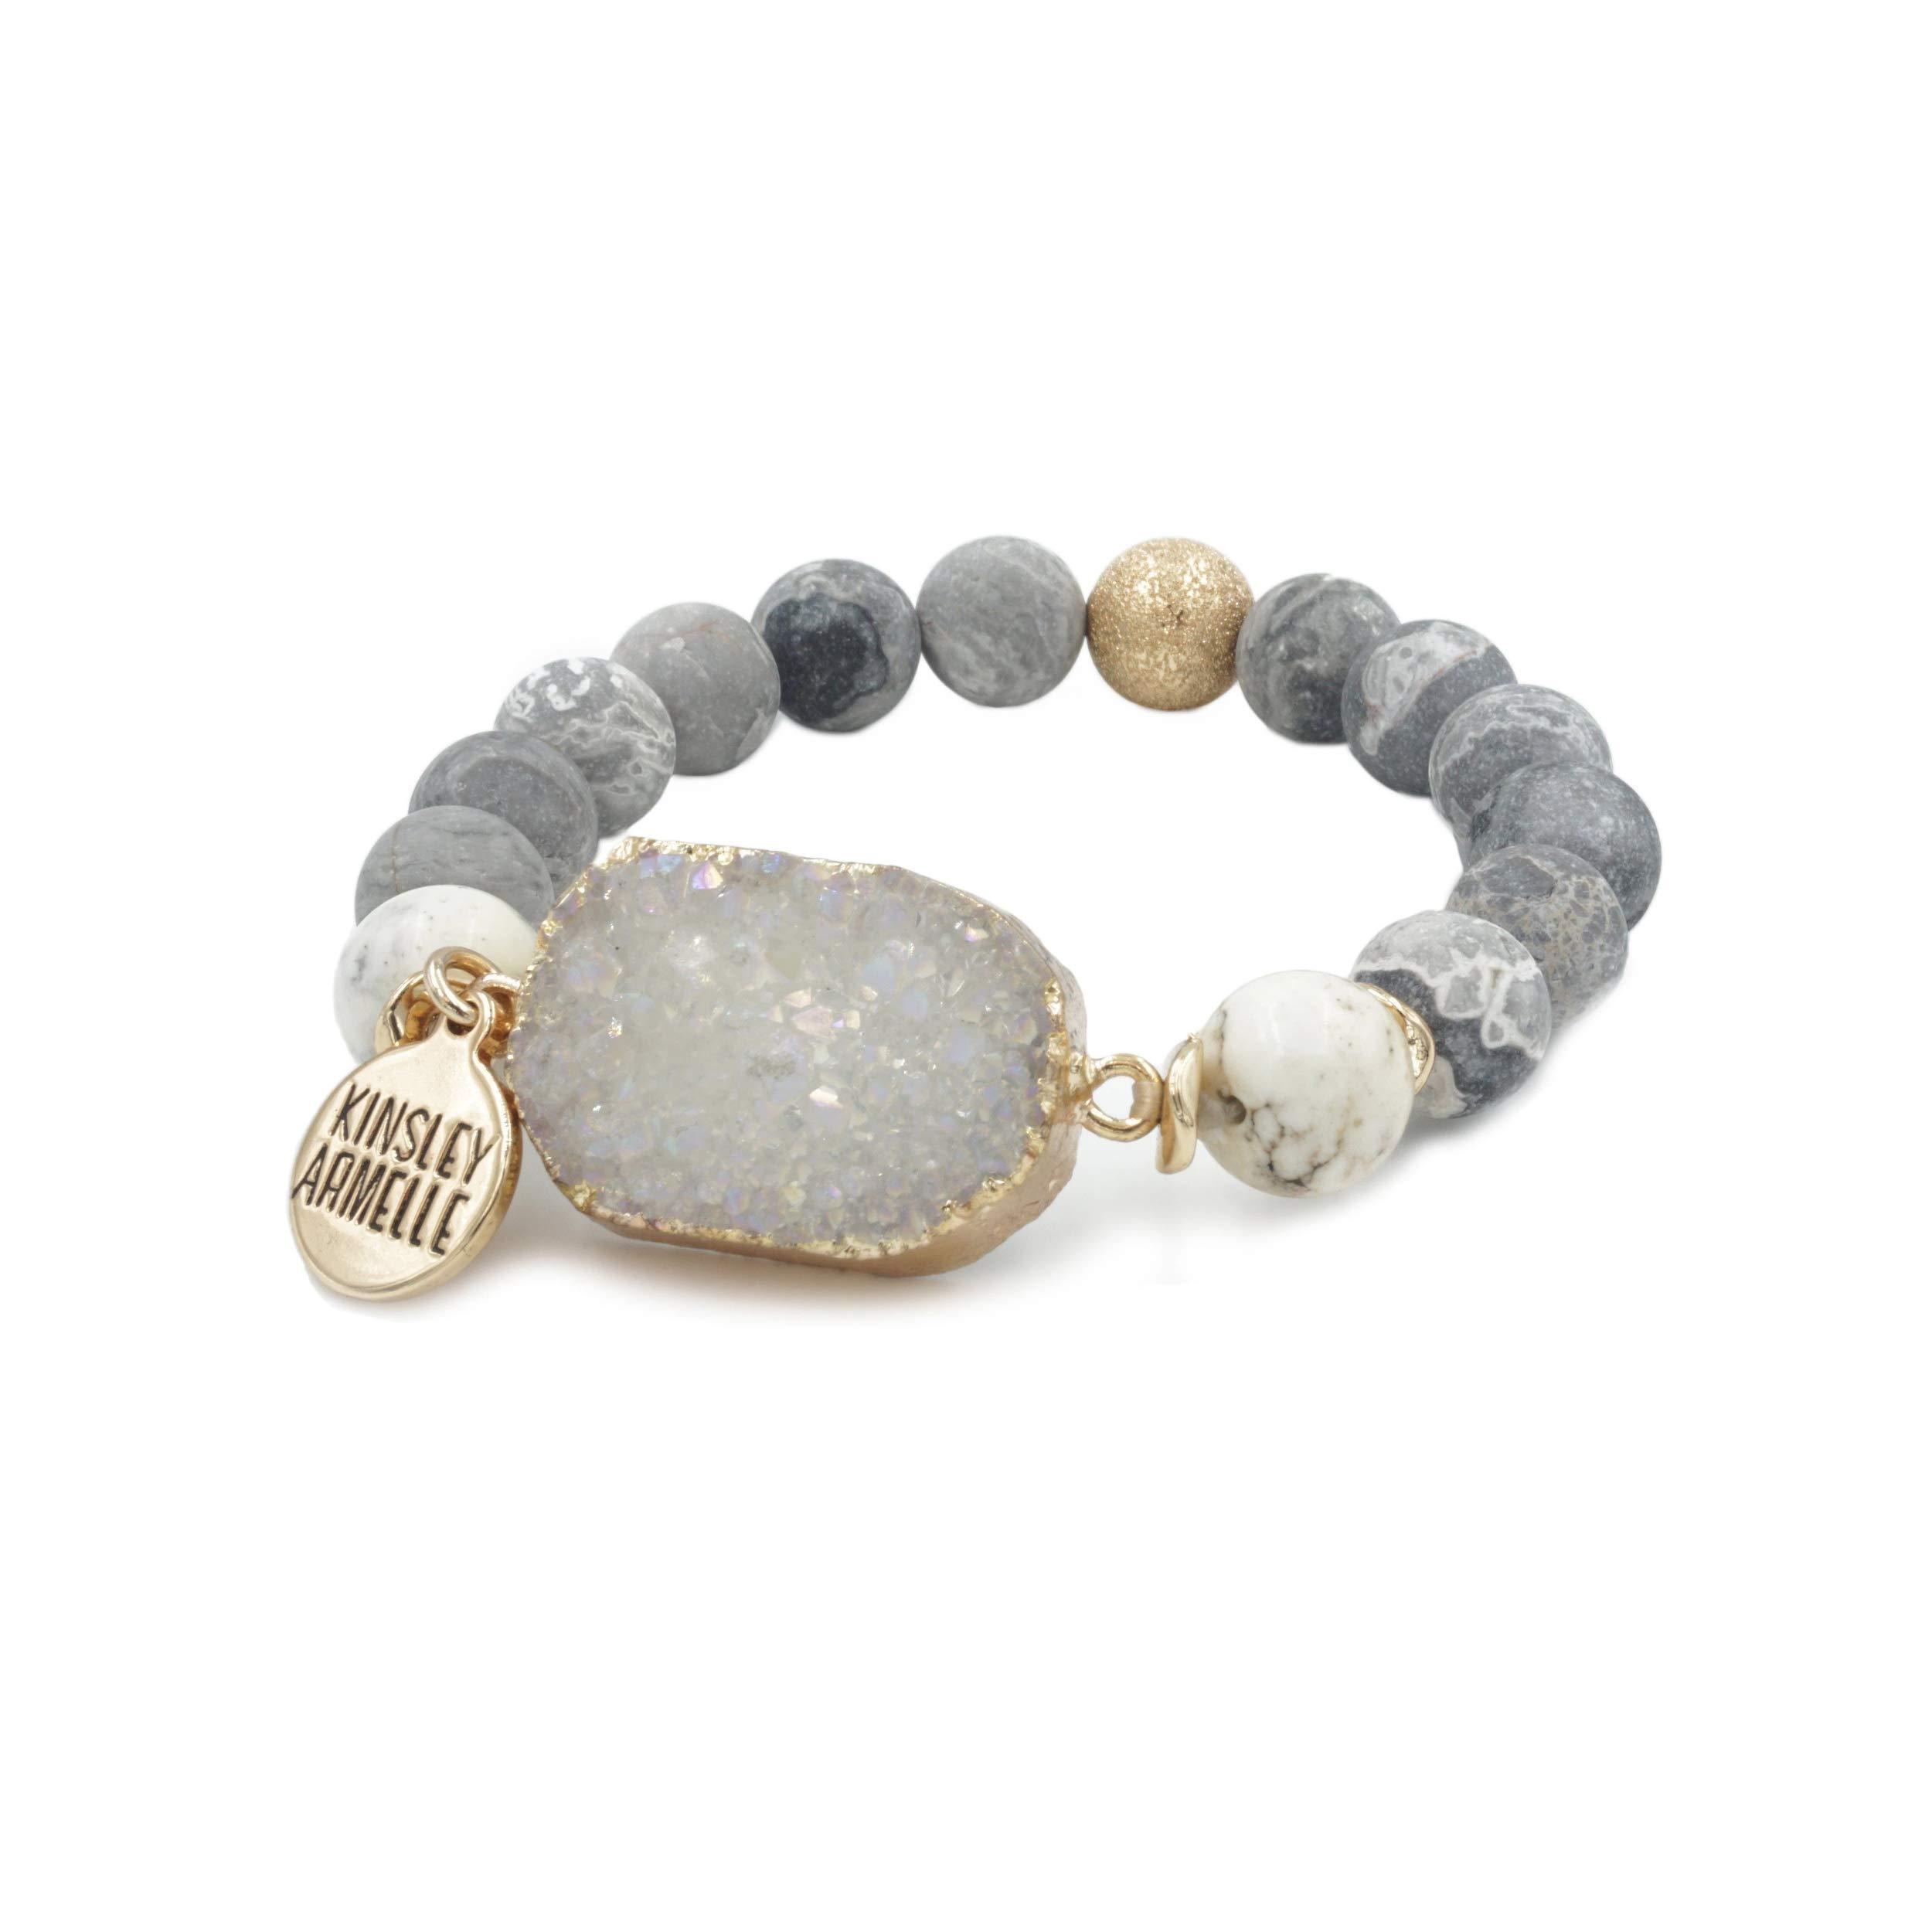 Kinsley Armelle Stone Collection - Dusk Bracelet by Kinsley Armelle